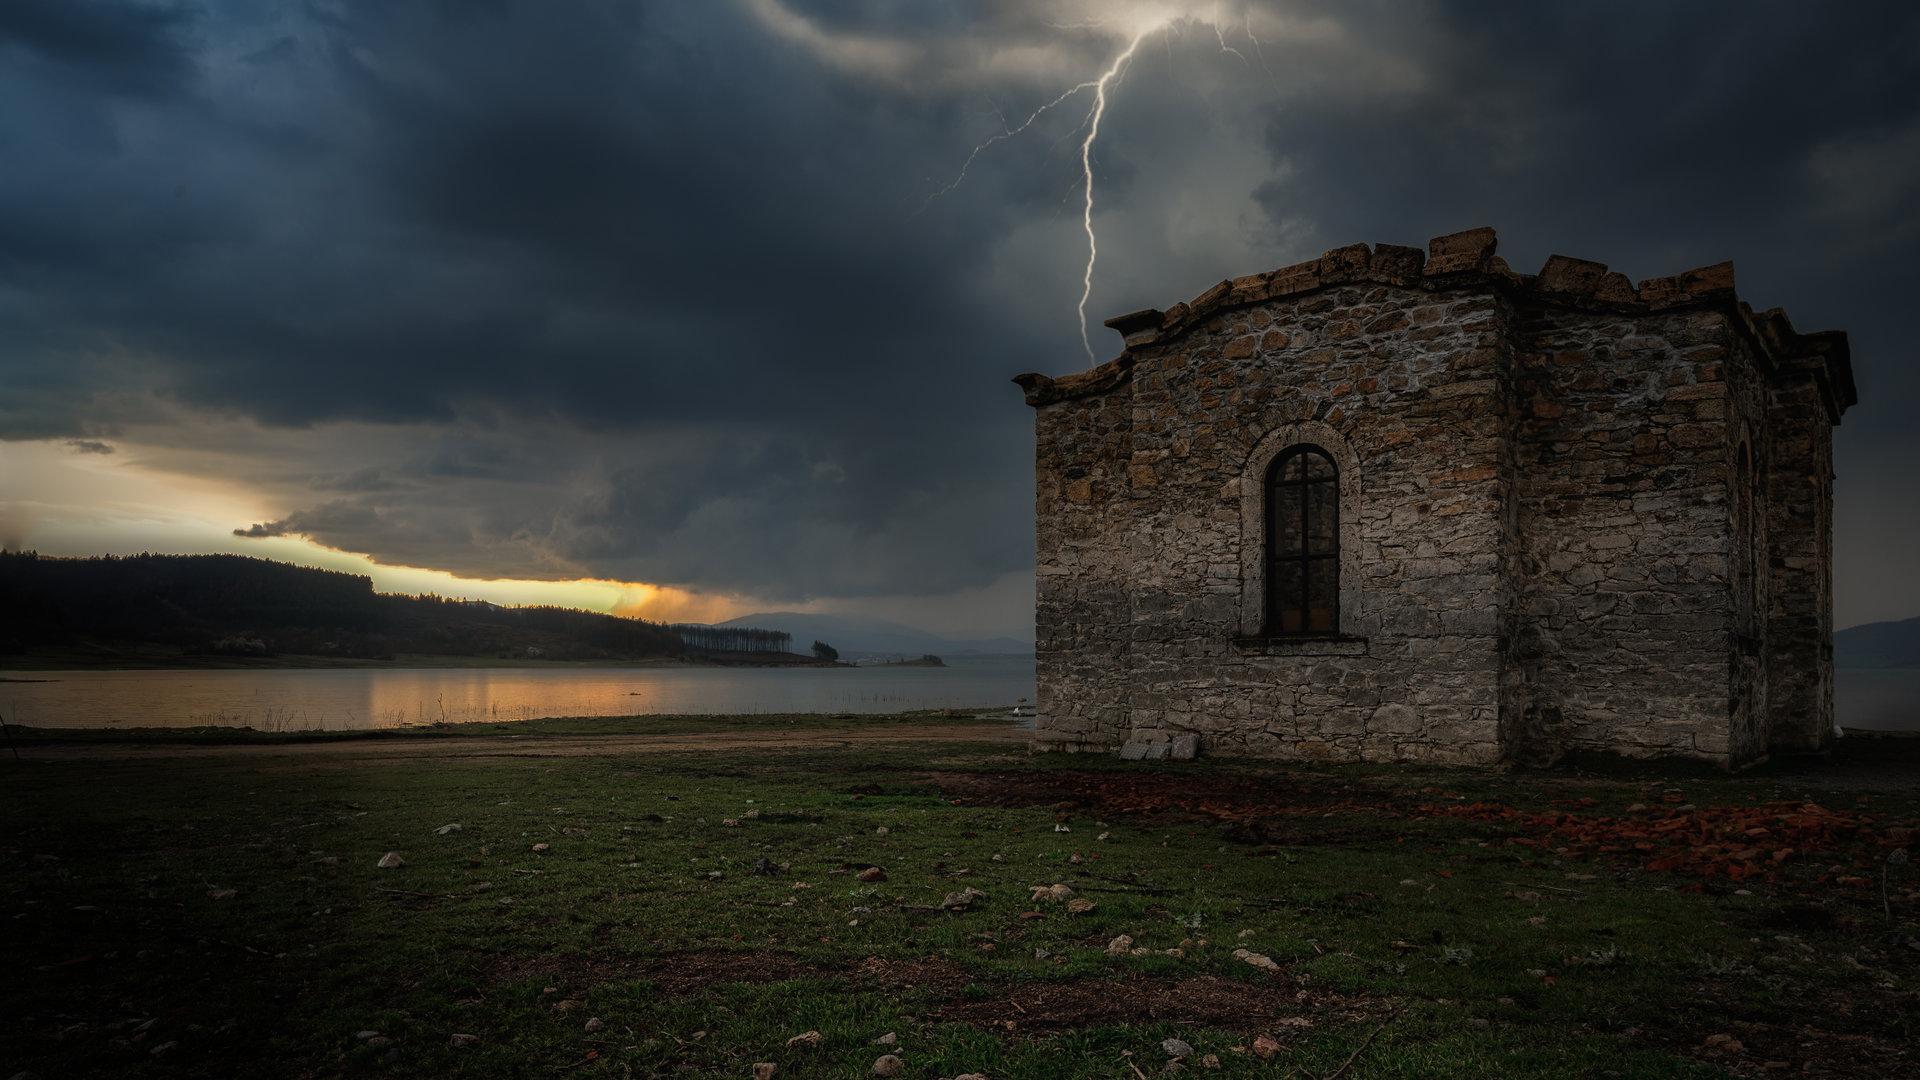 Във окото на бурята | Author Georgi Nunev - jorojeton | PHOTO FORUM